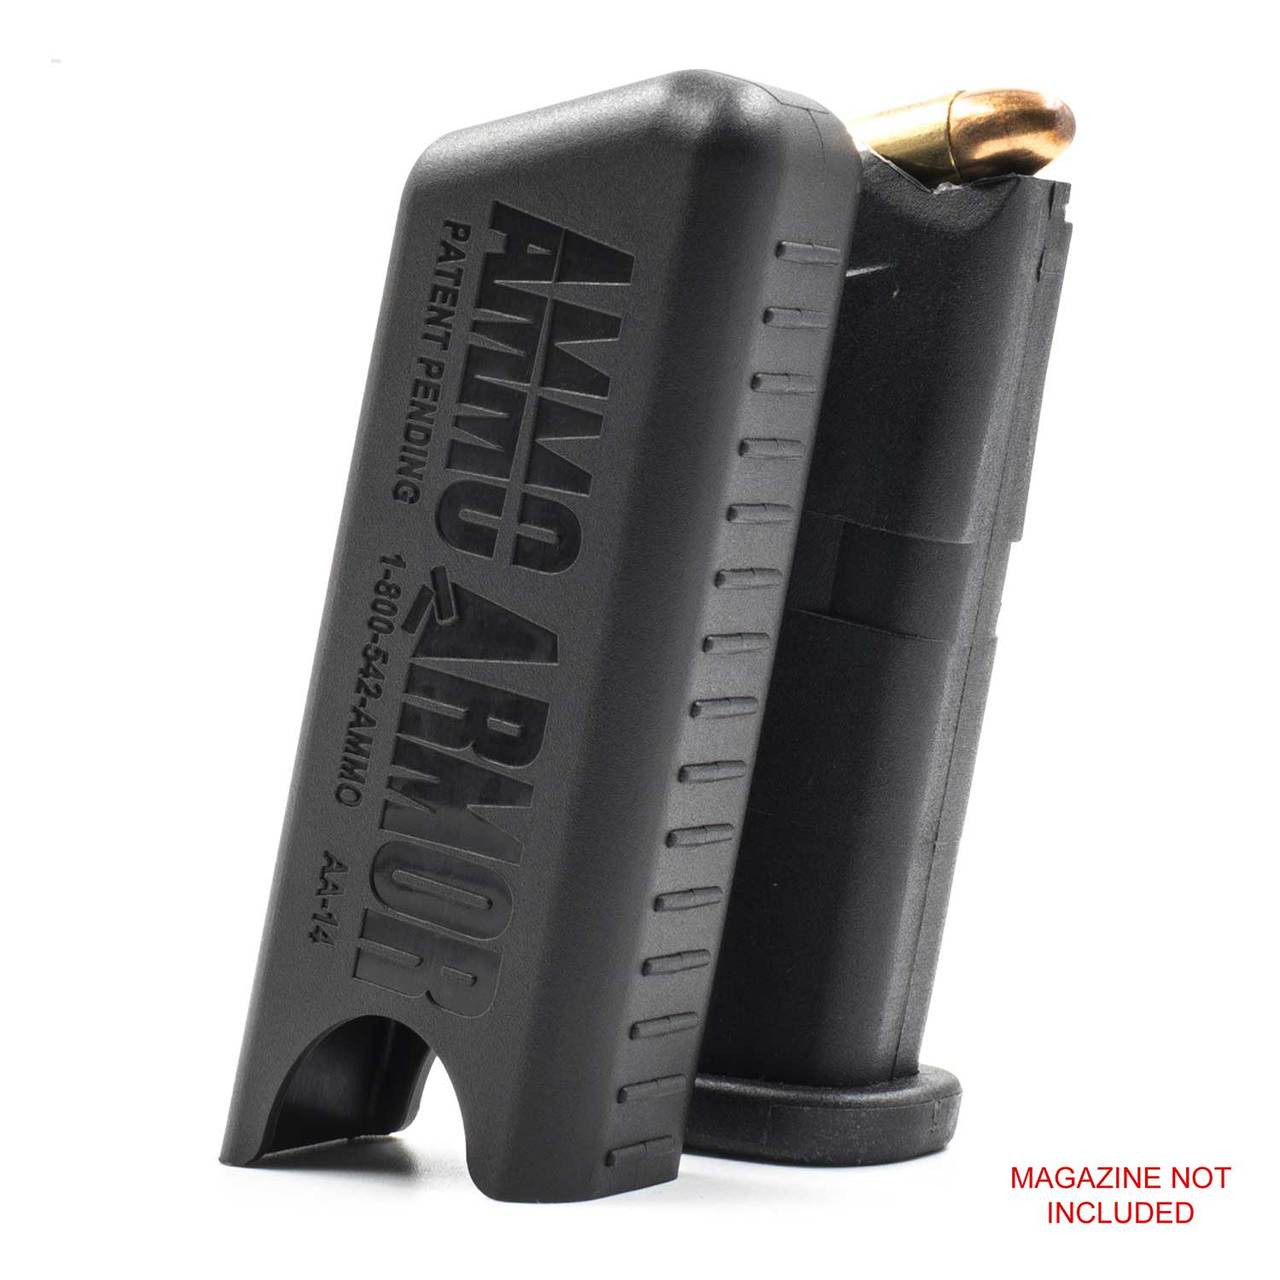 Glock 42 Magazine Protector